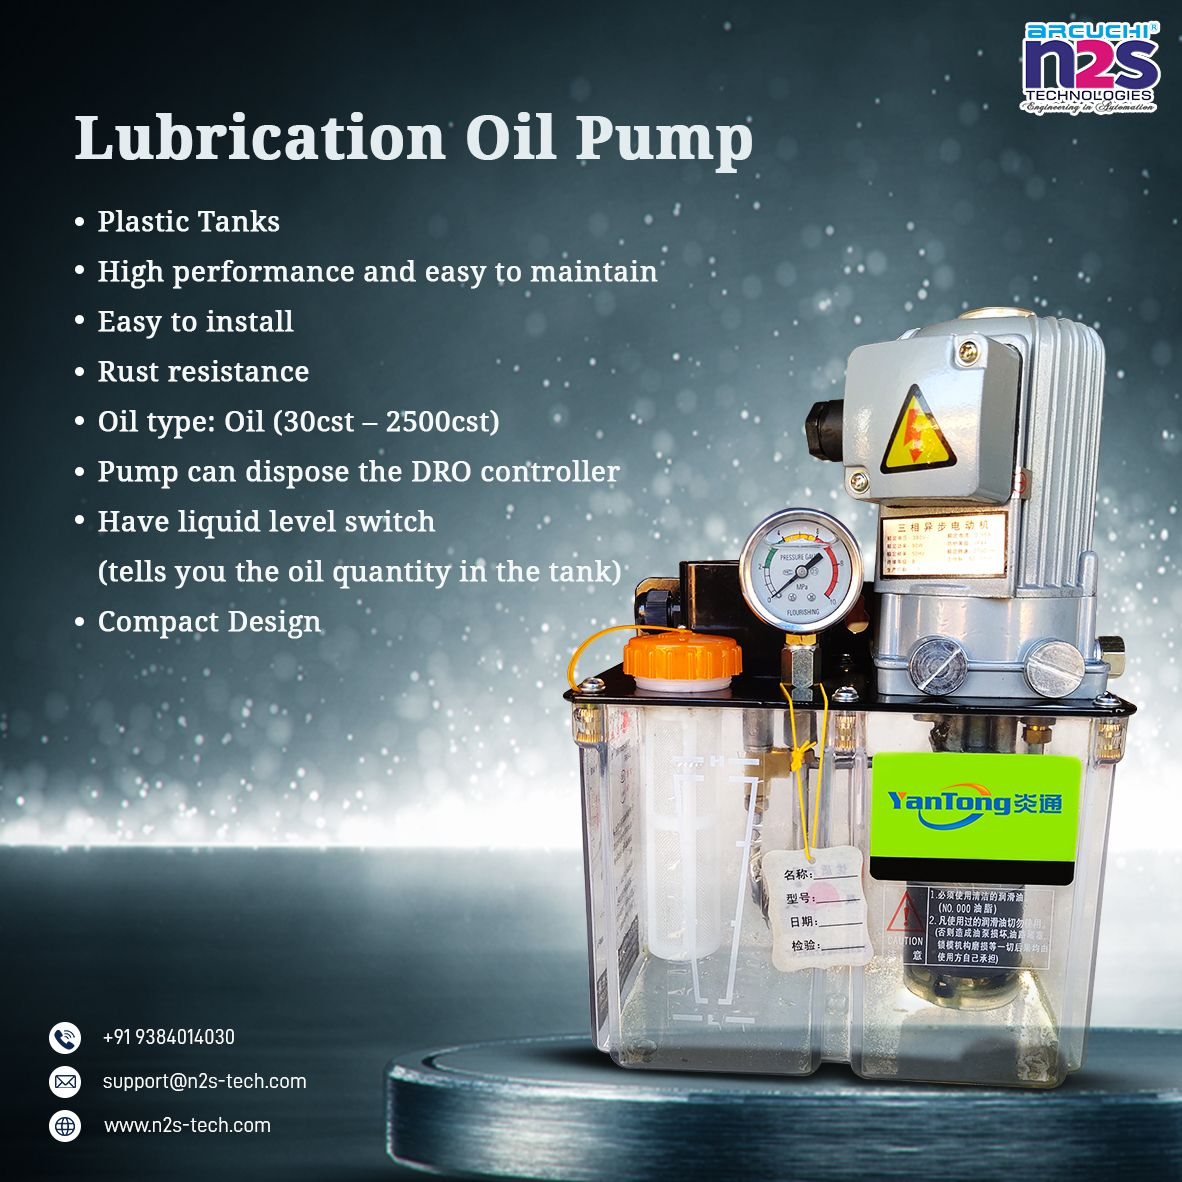 Lubrication Oil Pump Lubricants Oils Plastic Injection Moulding Machine